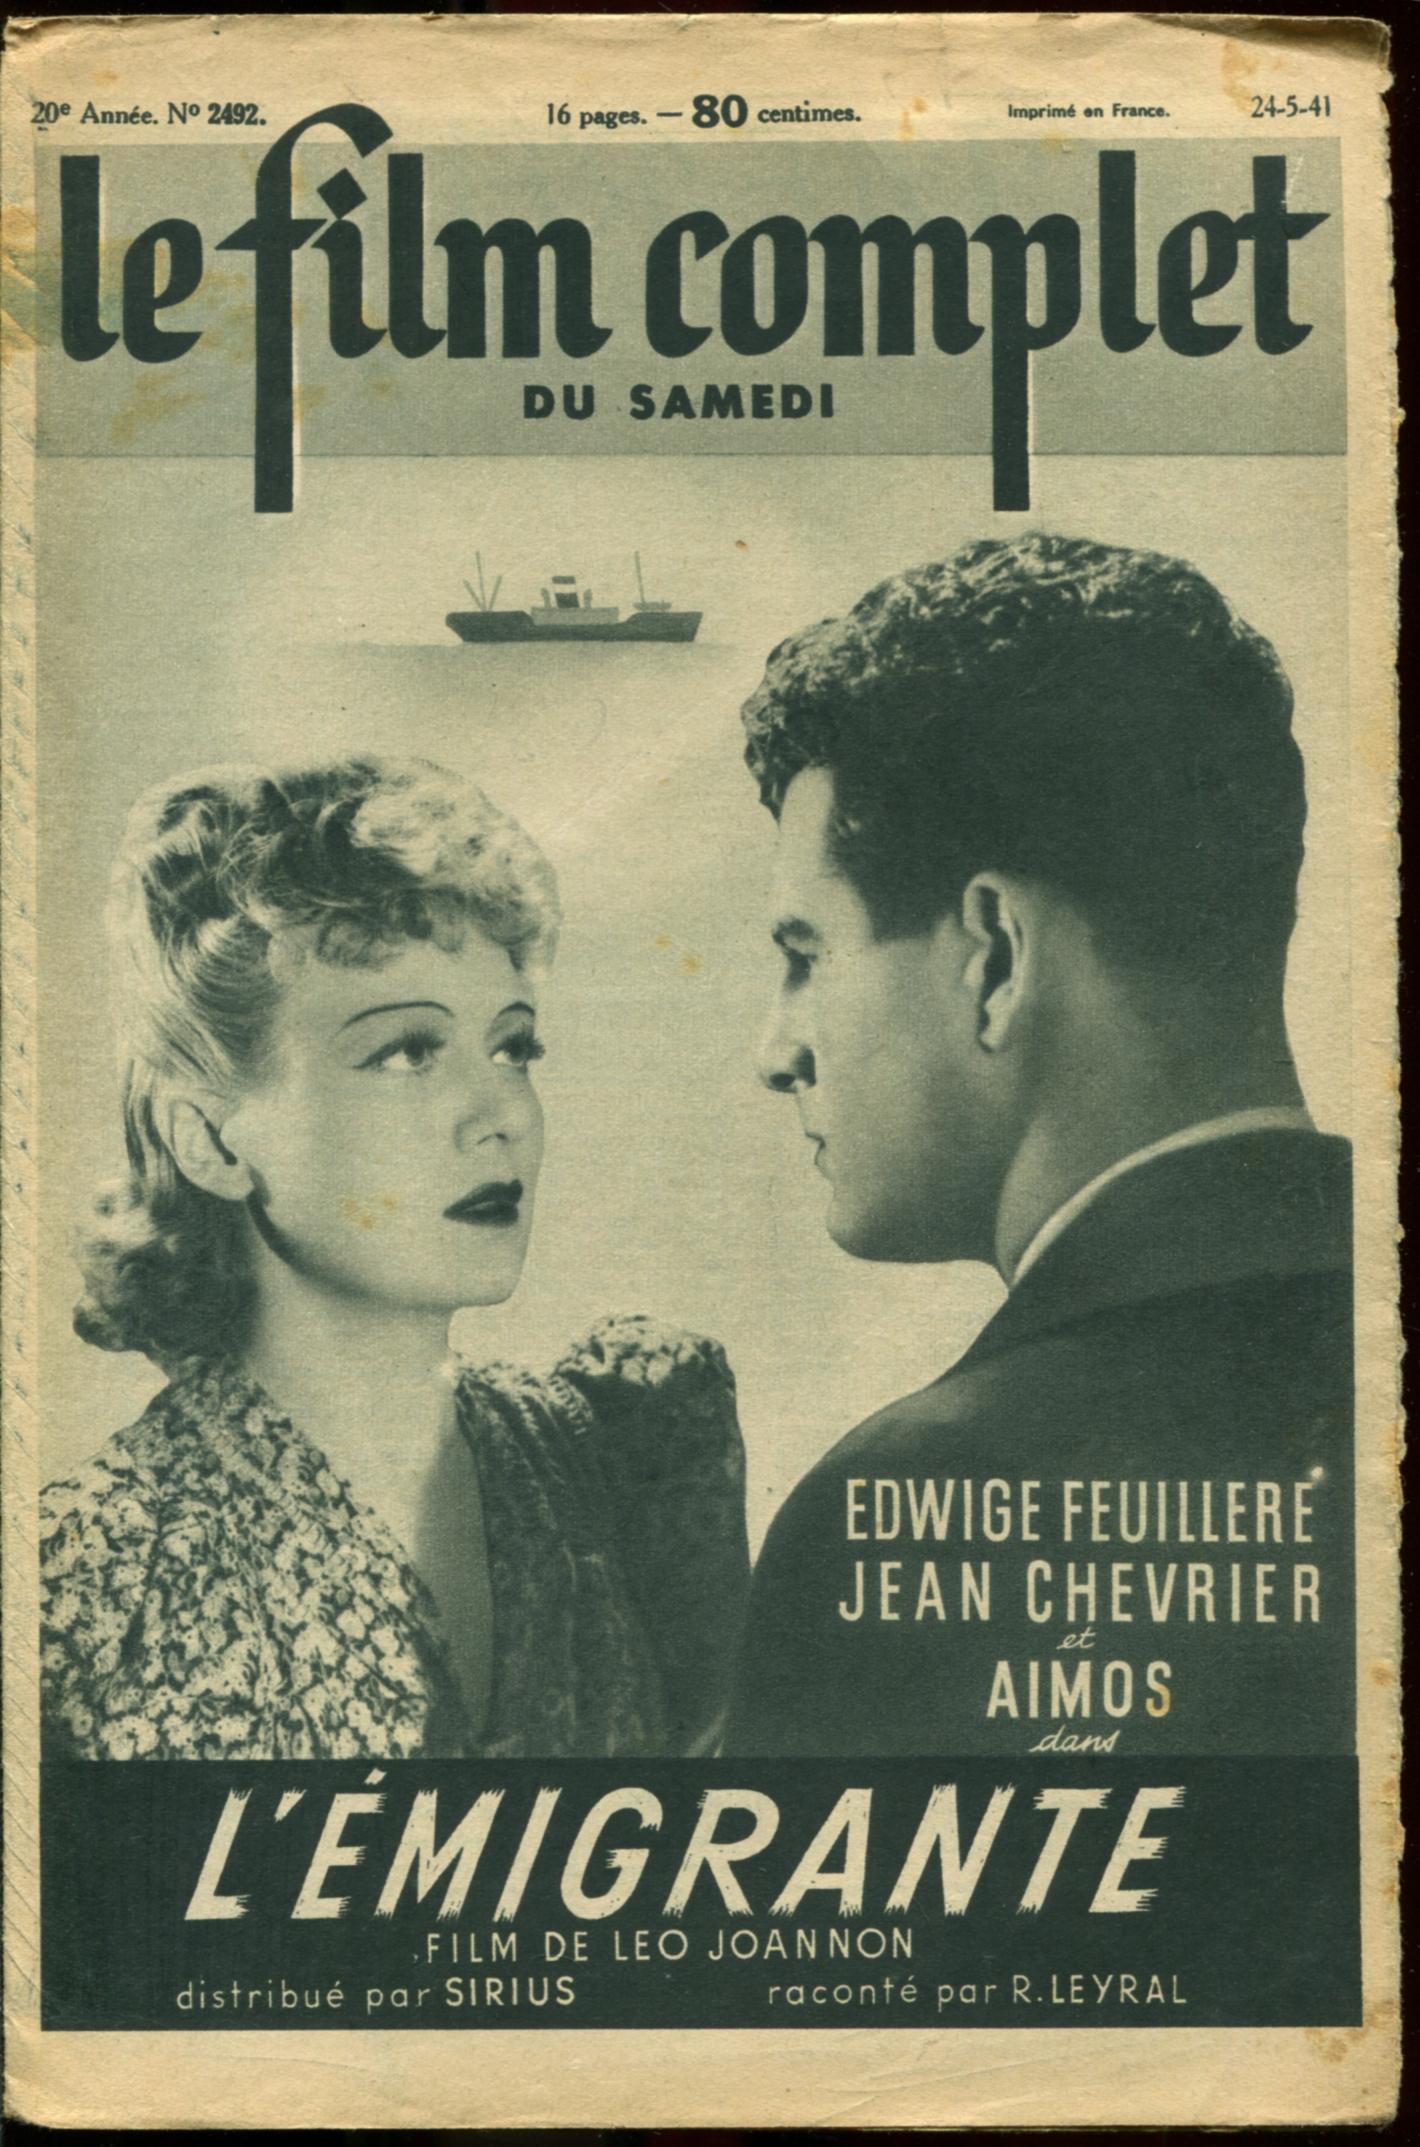 Jean Chevrier and Edwige Feuillère in L'émigrante (1940)